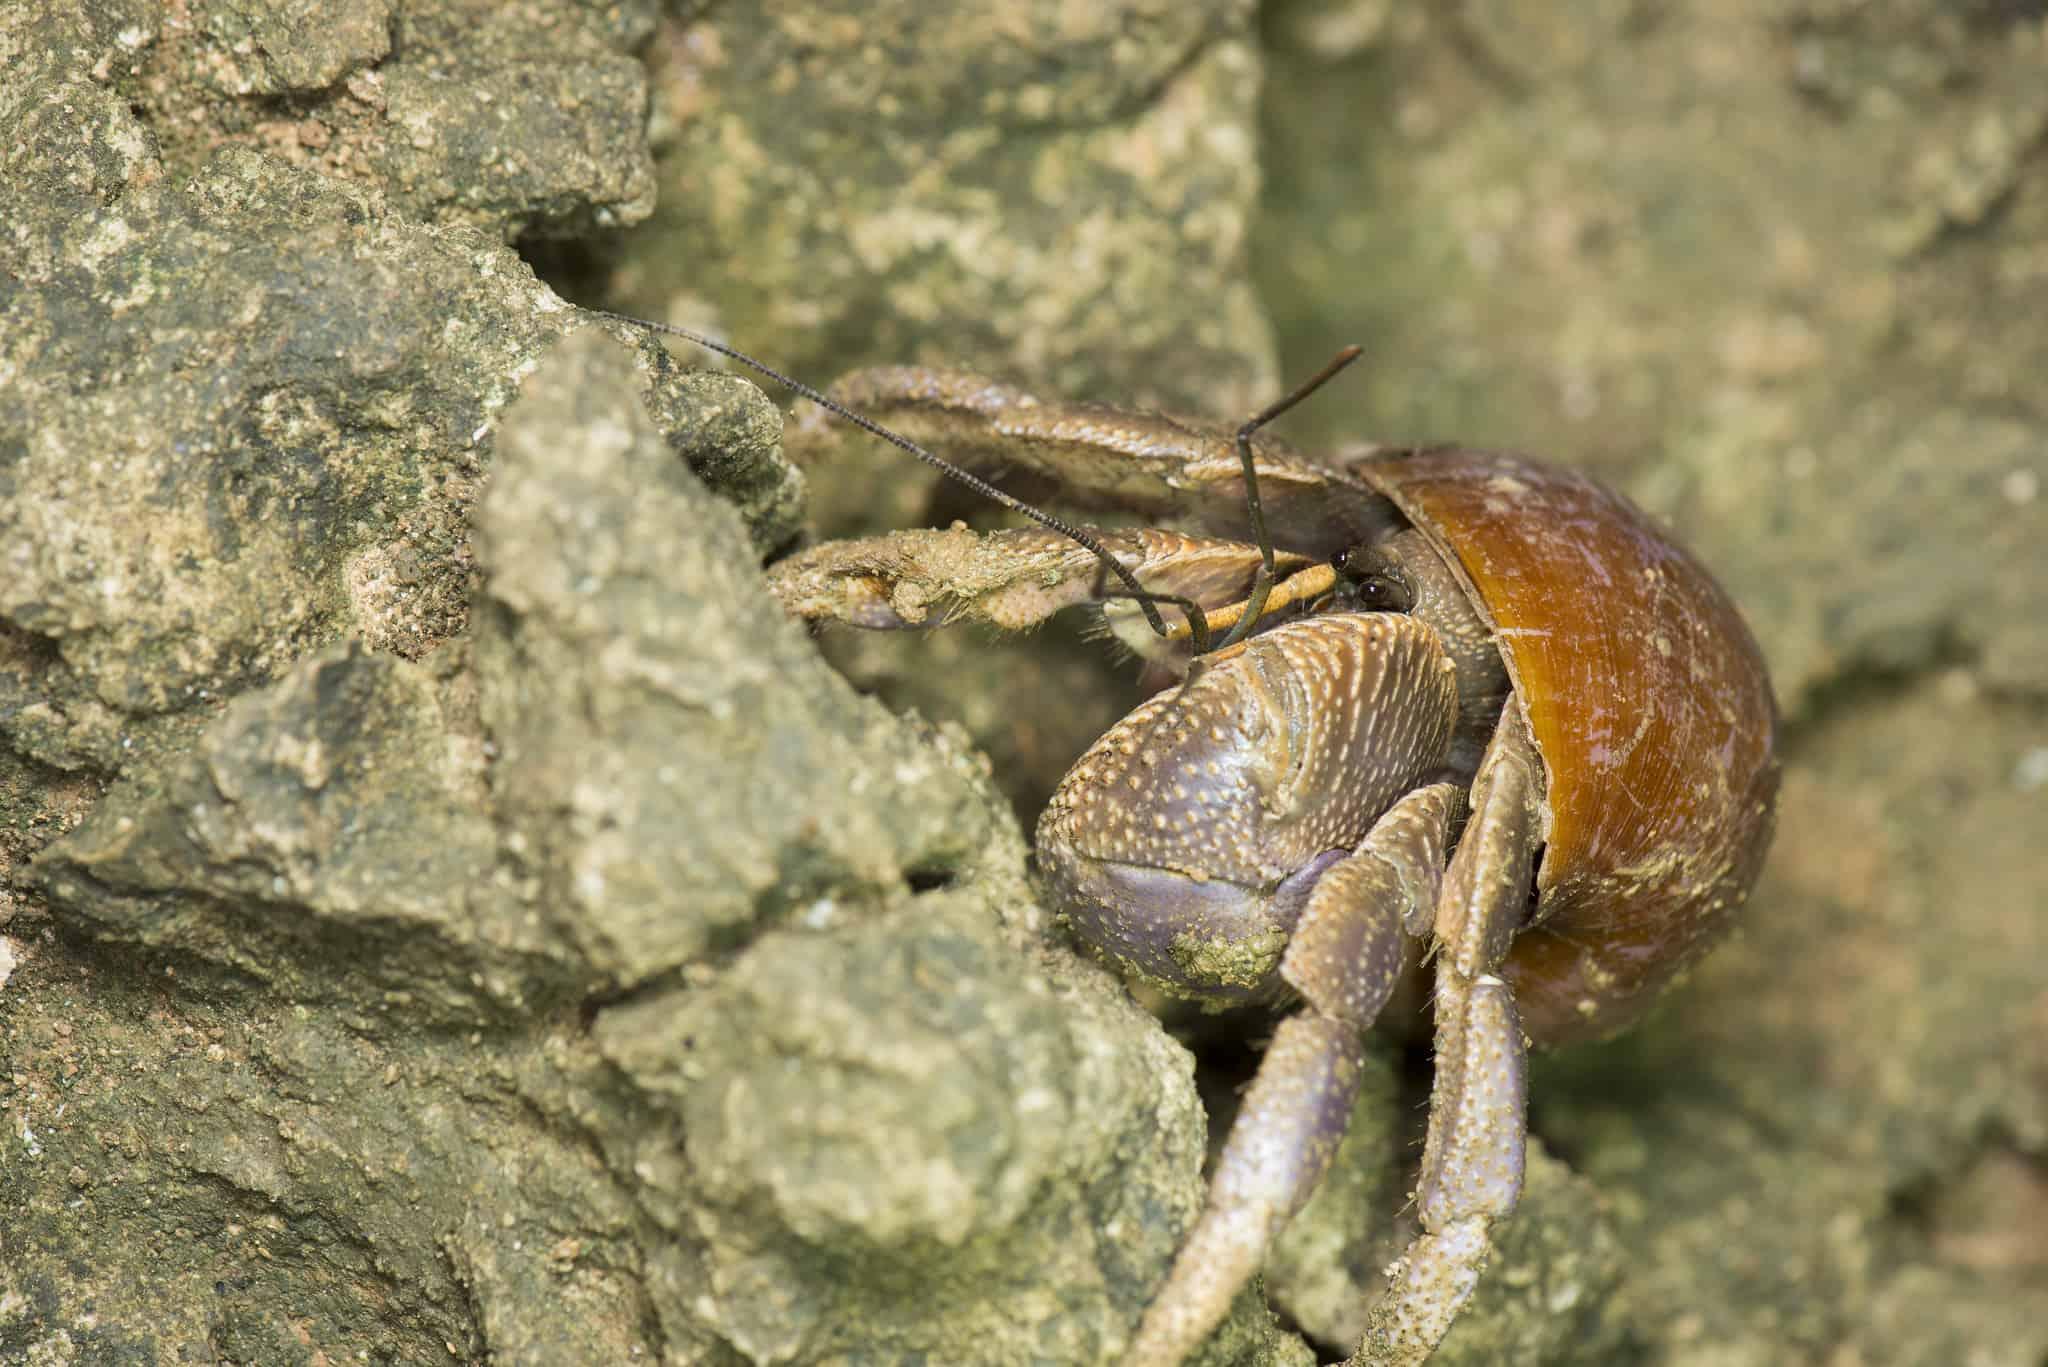 hermit crab on the rock